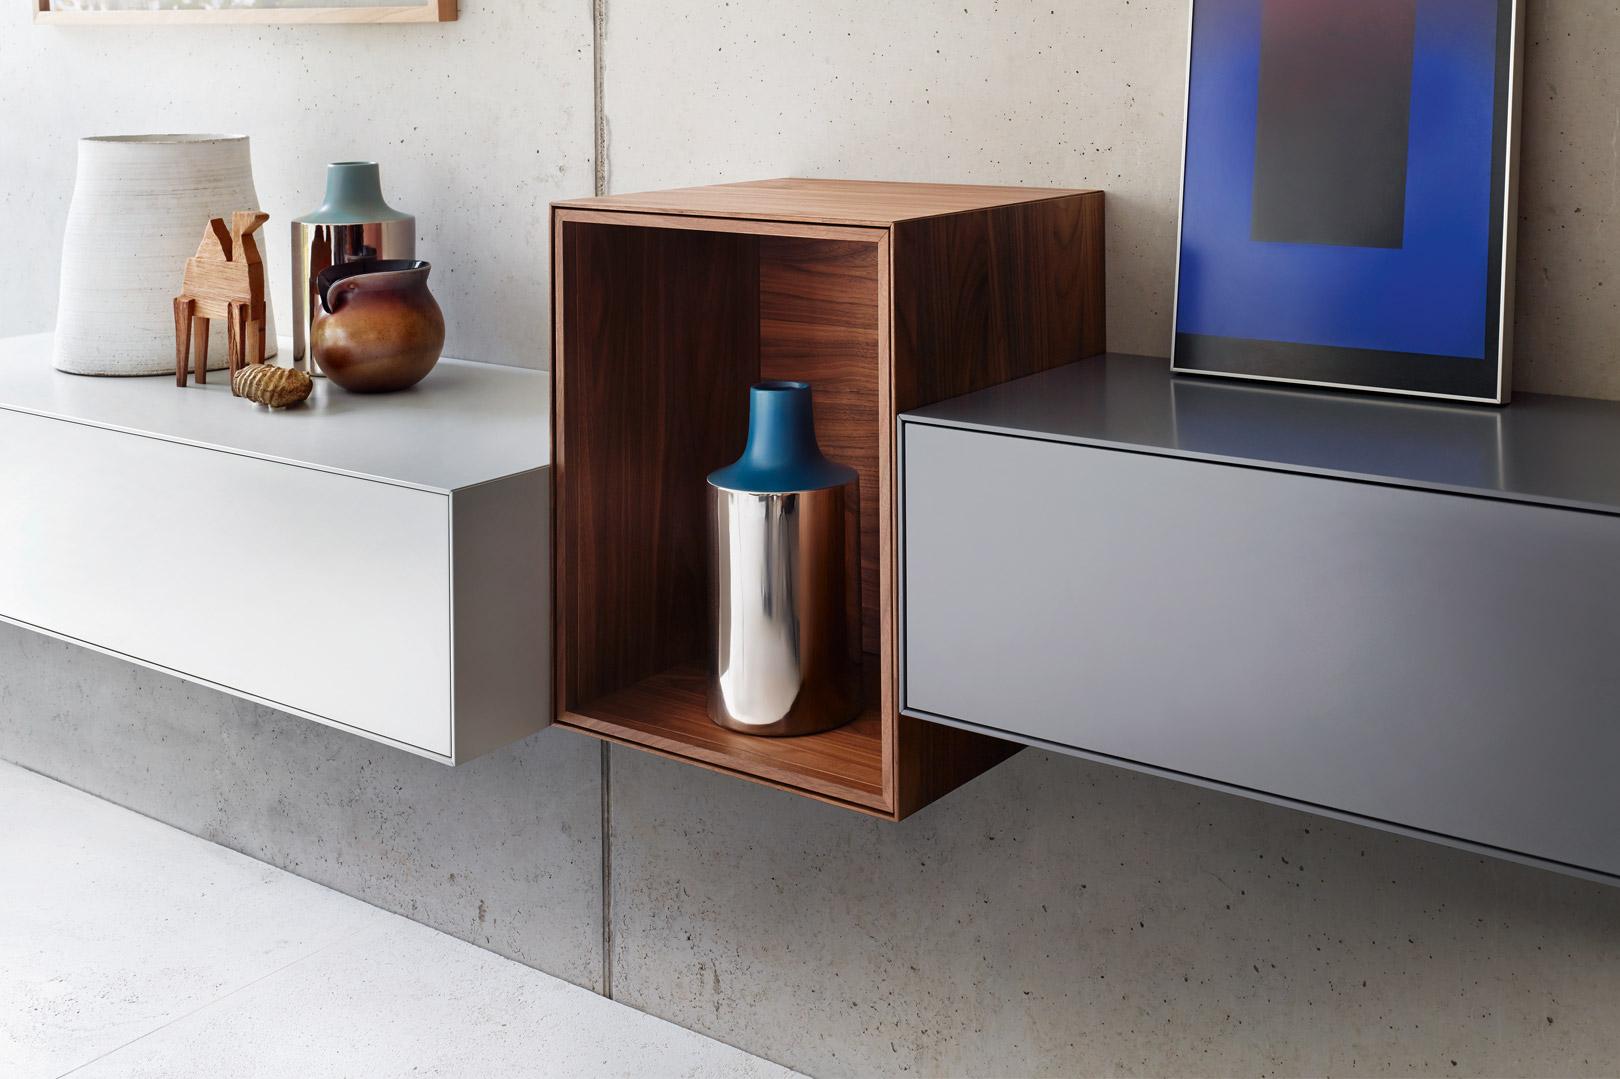 piure nex box jan luppes interieurs melles interieur. Black Bedroom Furniture Sets. Home Design Ideas